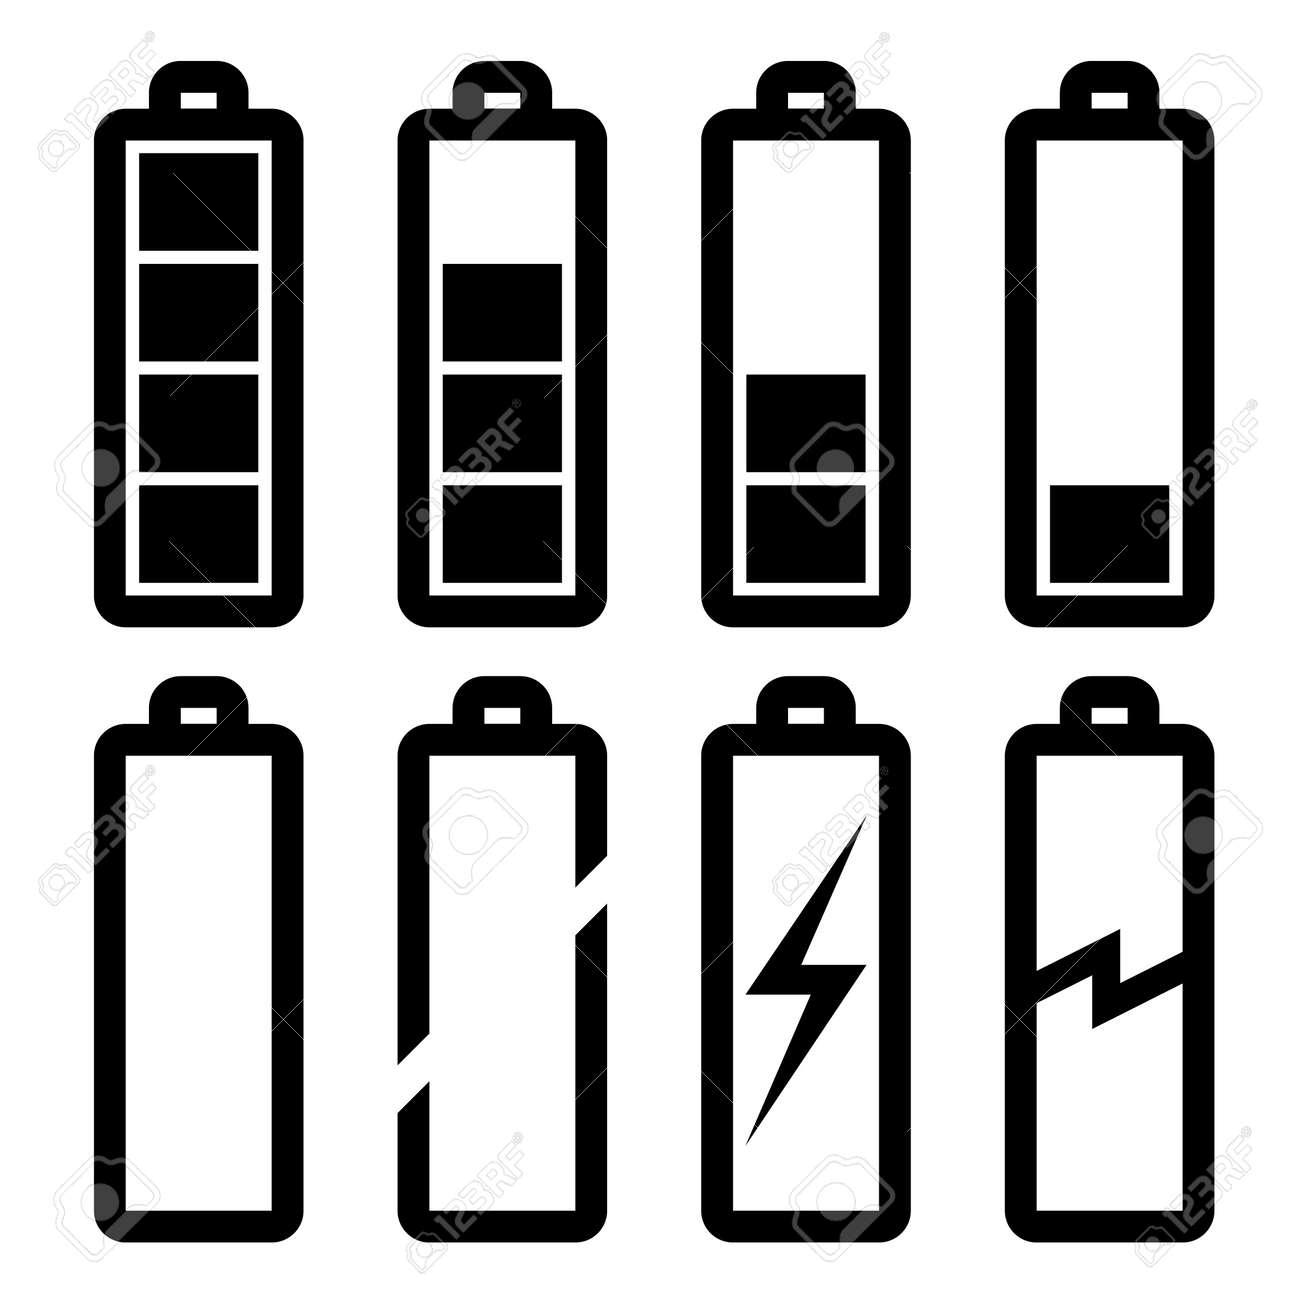 Vector Symbols Of Battery Level Royalty Free Cliparts, Vectors ...